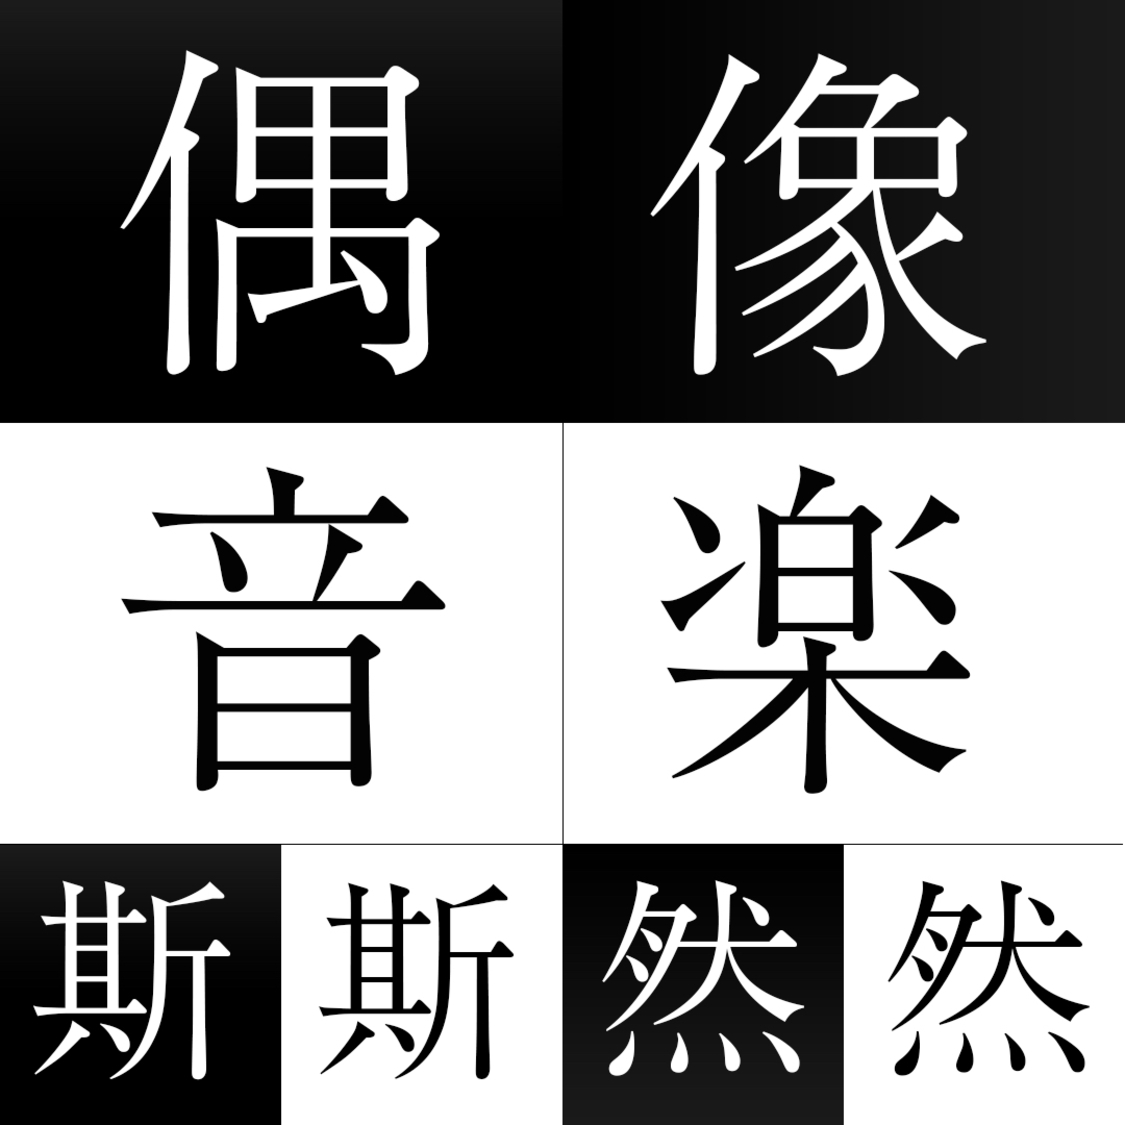 津野米咲の稀代な作家性と、≠ME、PIGGS、群青の世界……期待の可能性 5選|「偶像音楽 斯斯然然」第42回